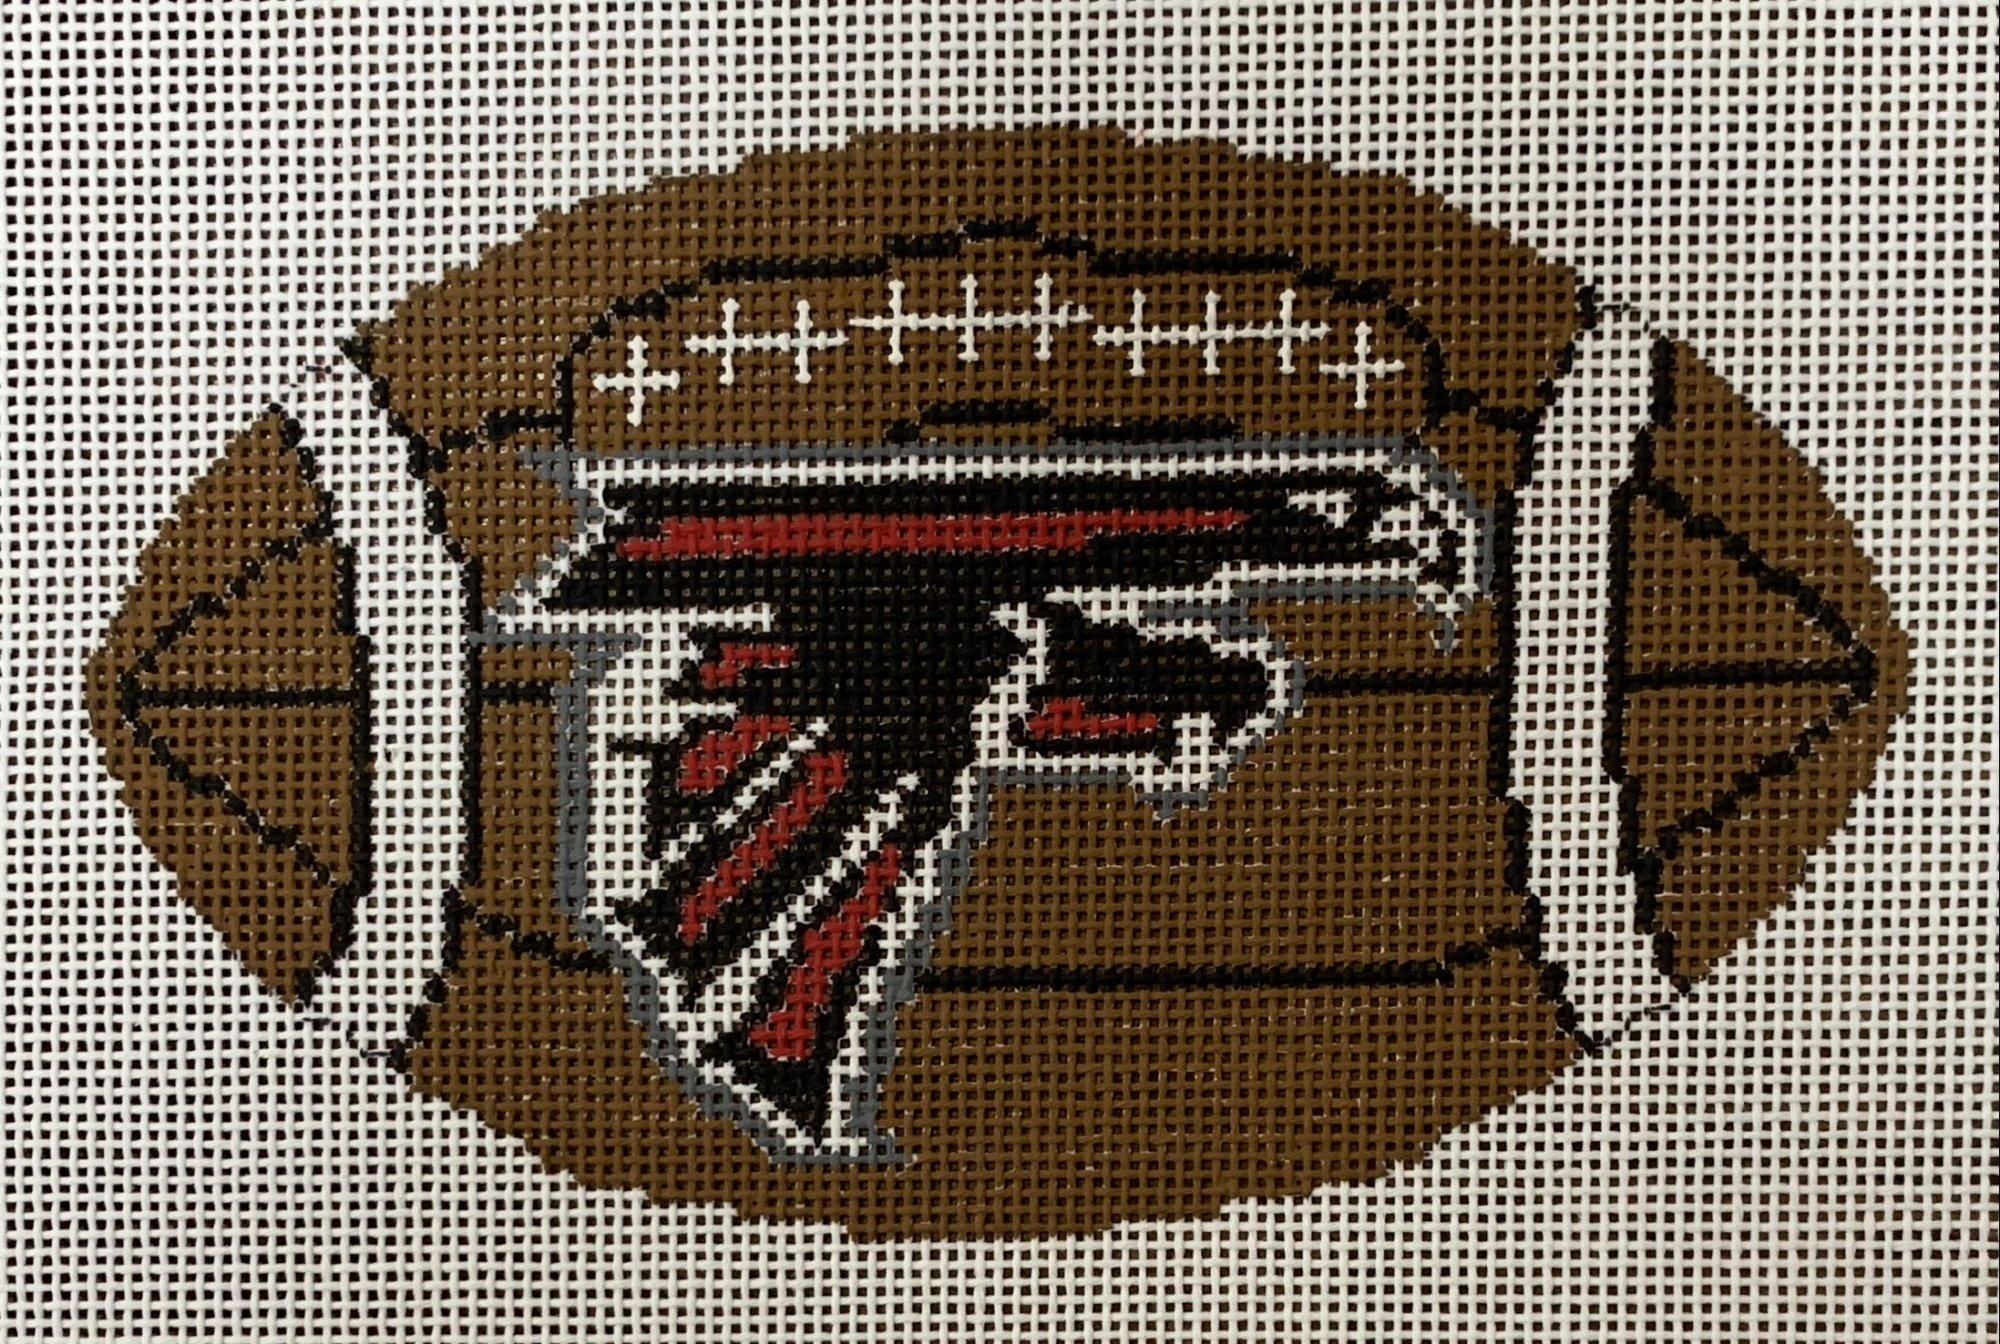 Football - Atlanta Falcons